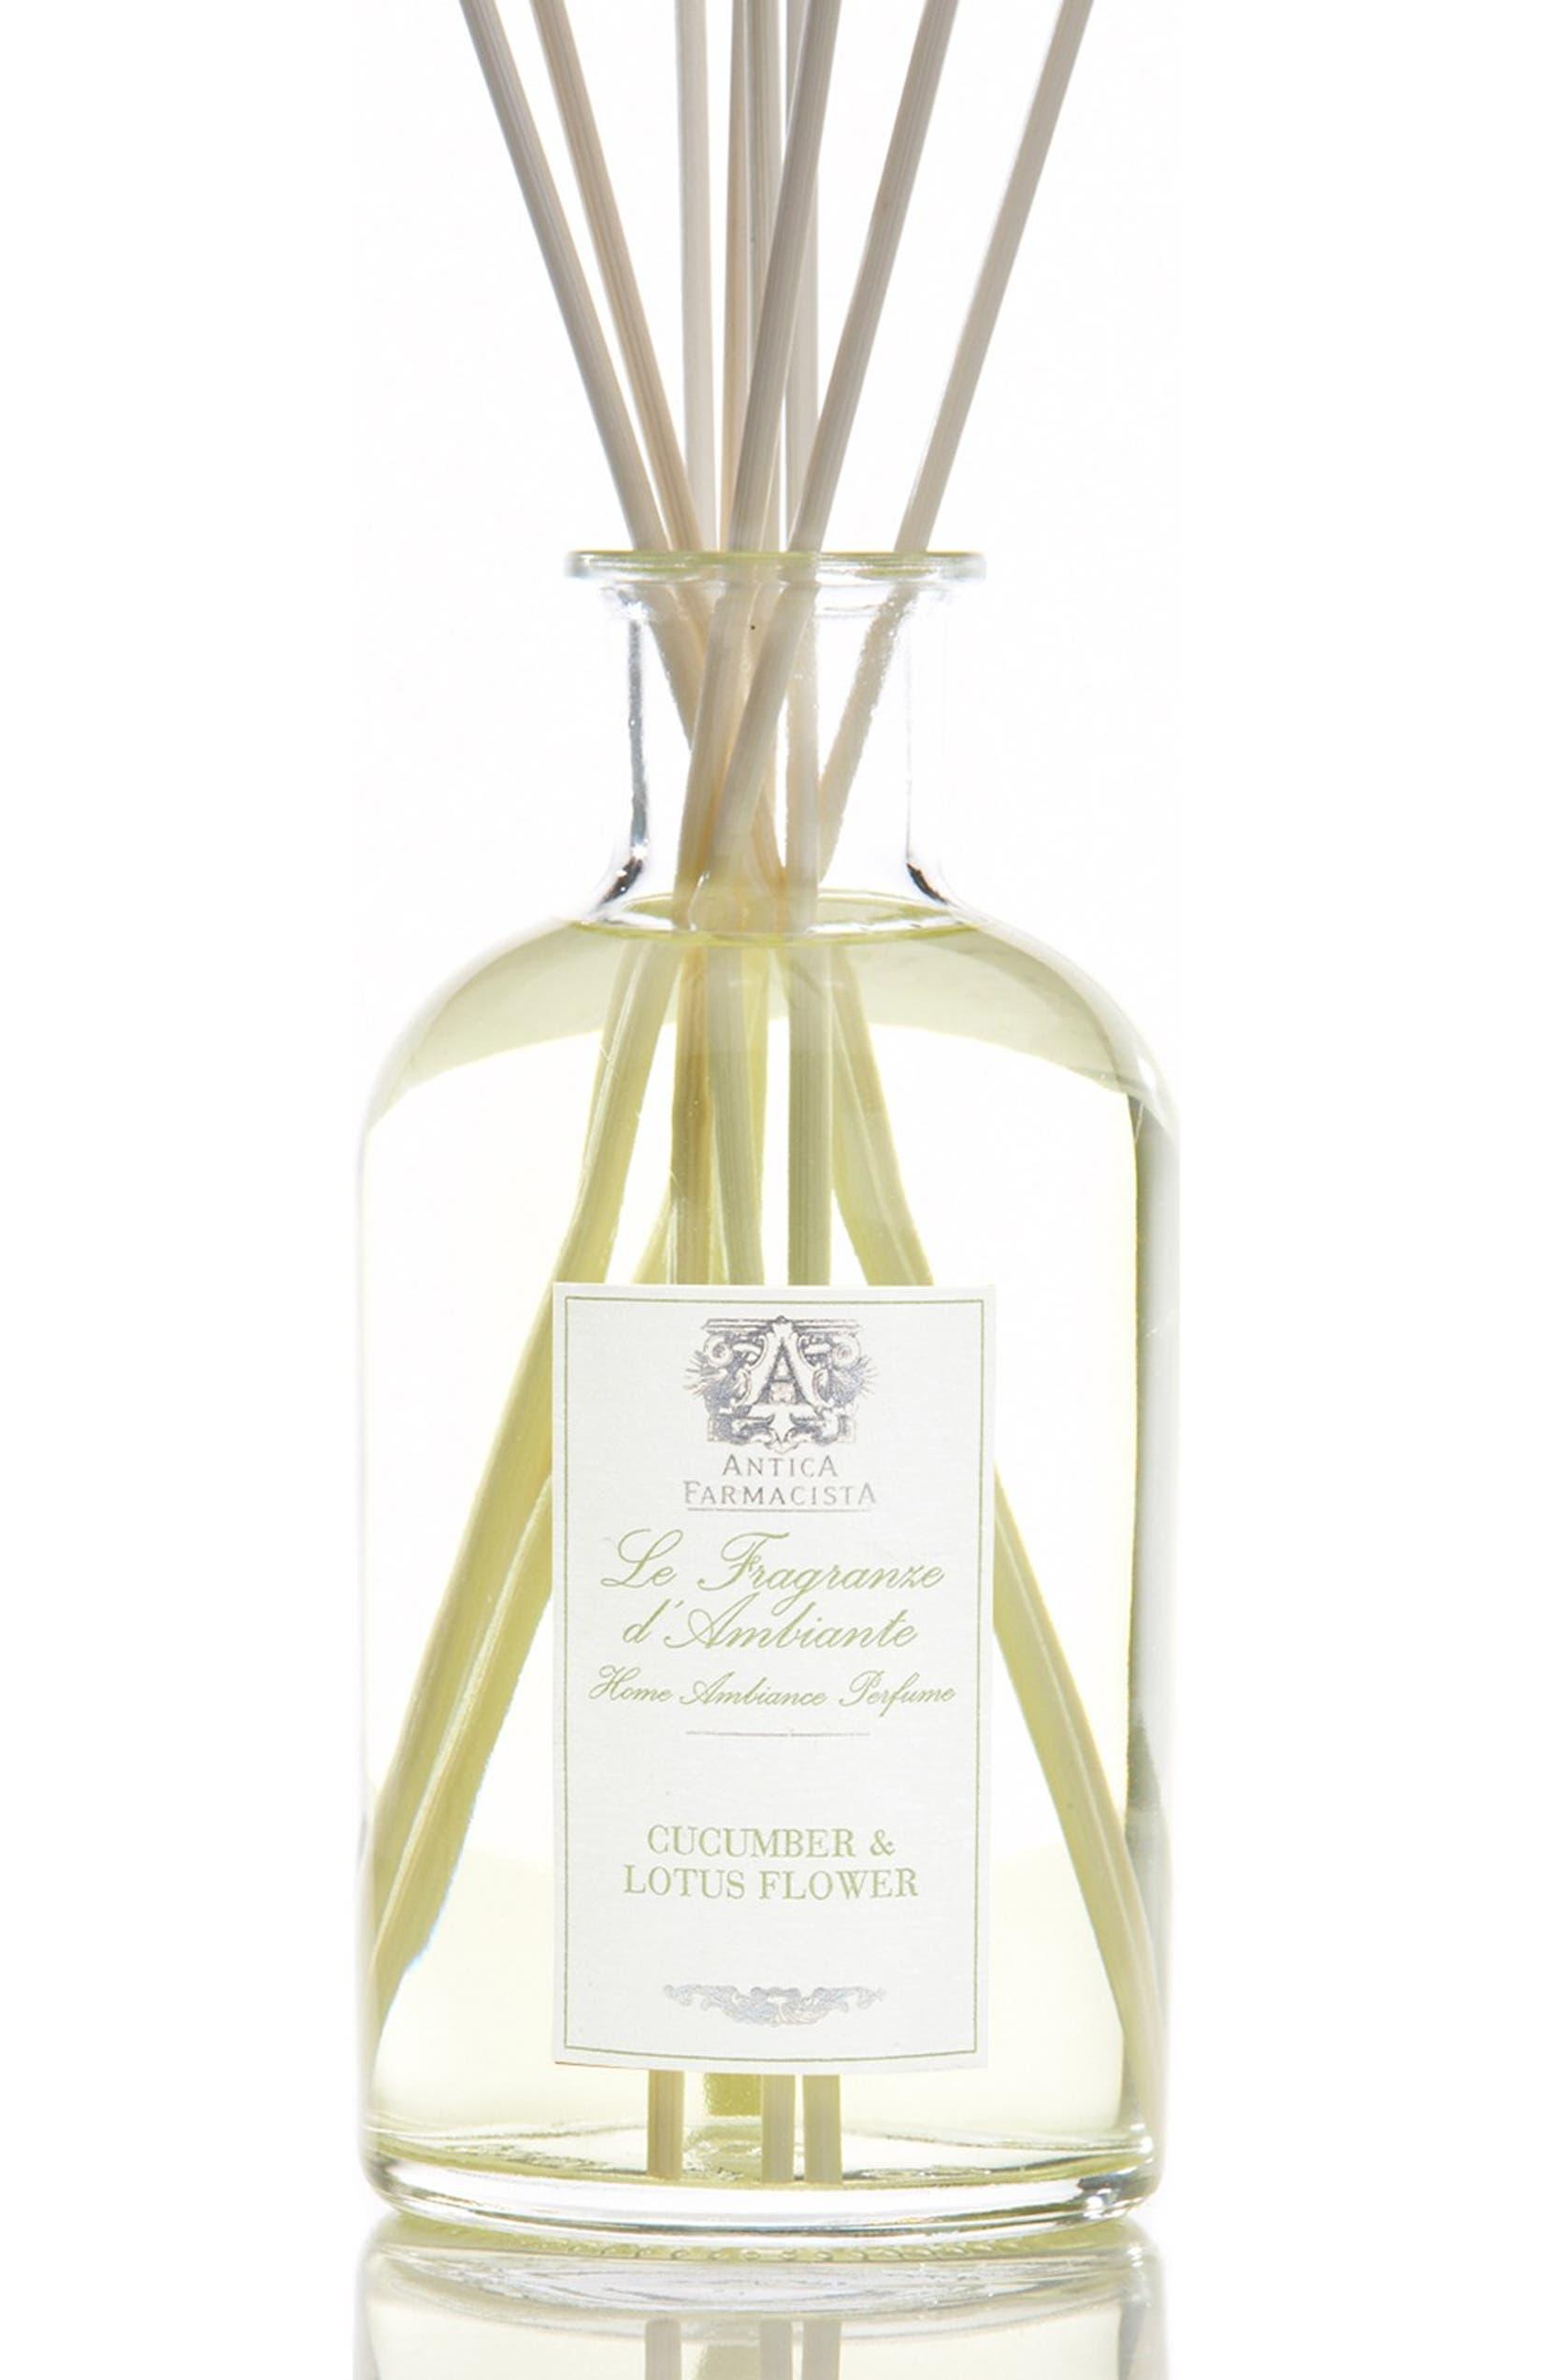 Antica Farmacista Cucumber Lotus Flower Home Ambiance Perfume